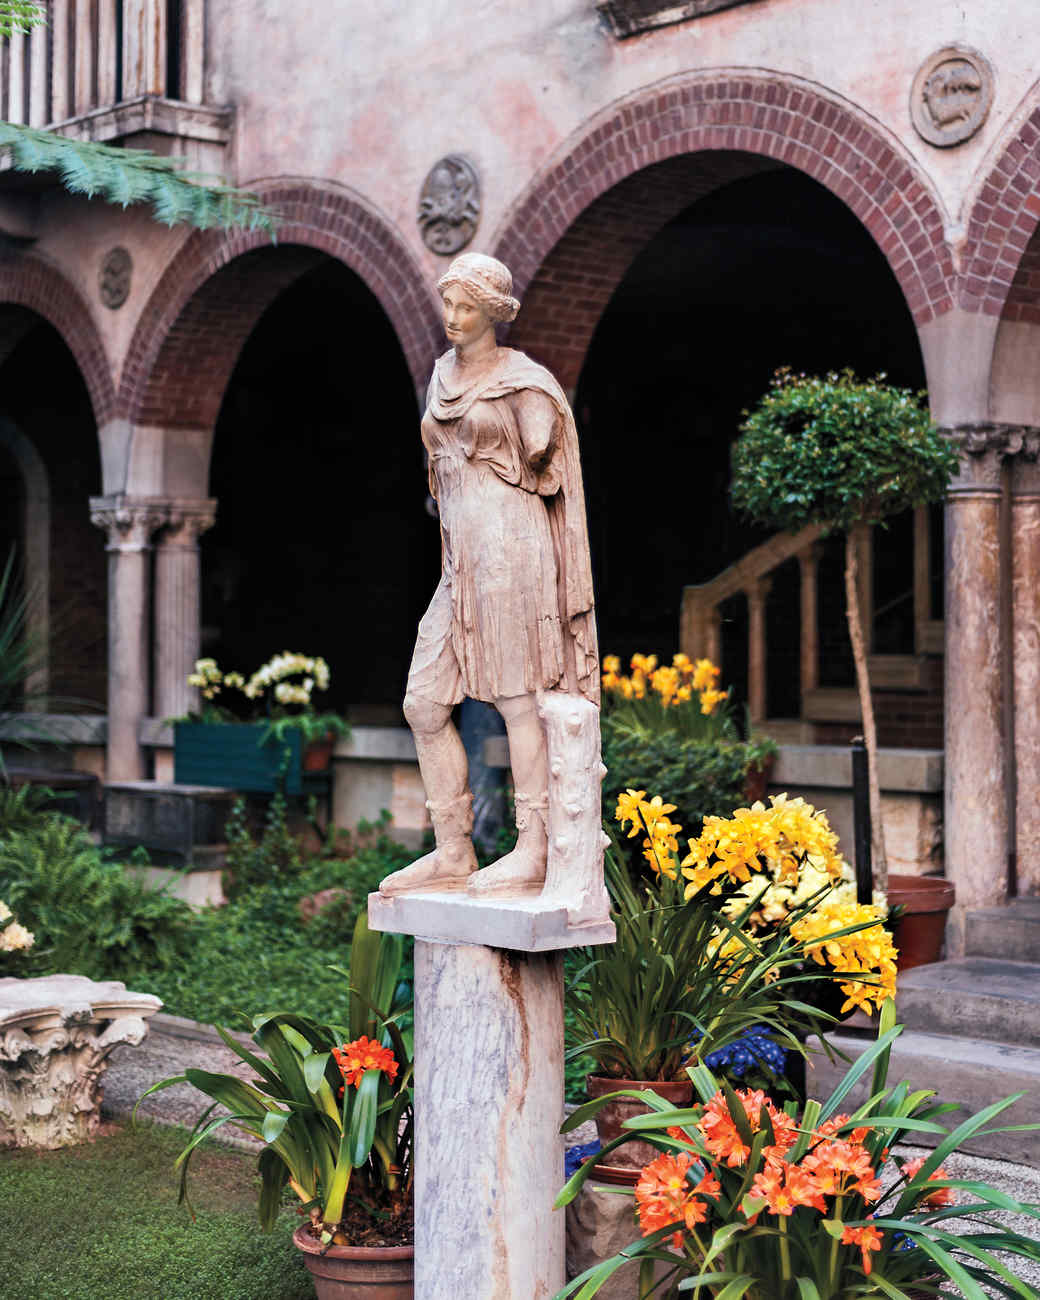 isabella-gardner-museum0002398-md110166.jpg